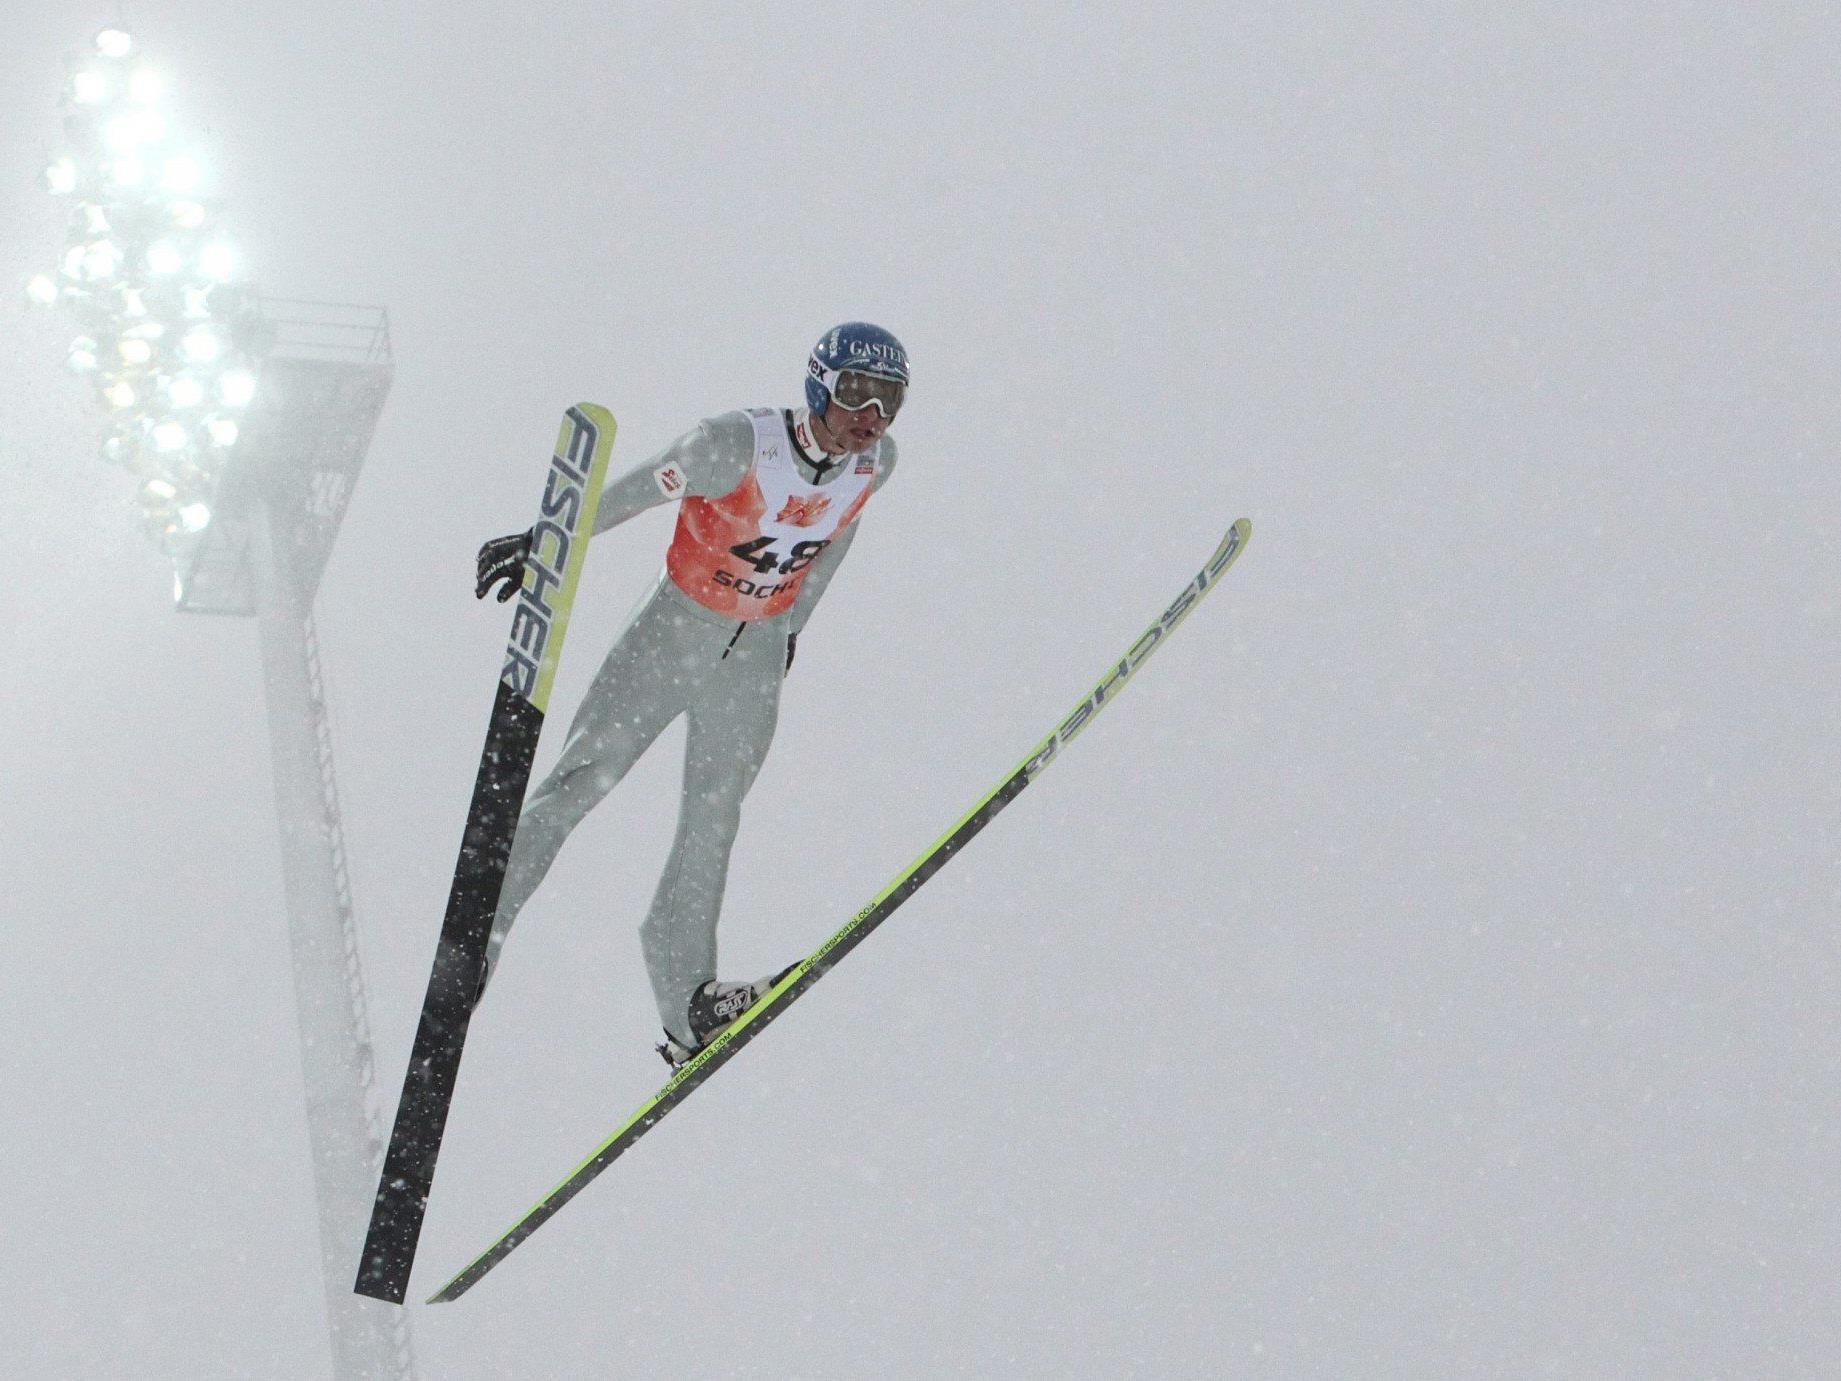 Gruber gewann Olympiageneralprobe in Sotschi, Denifl 3.